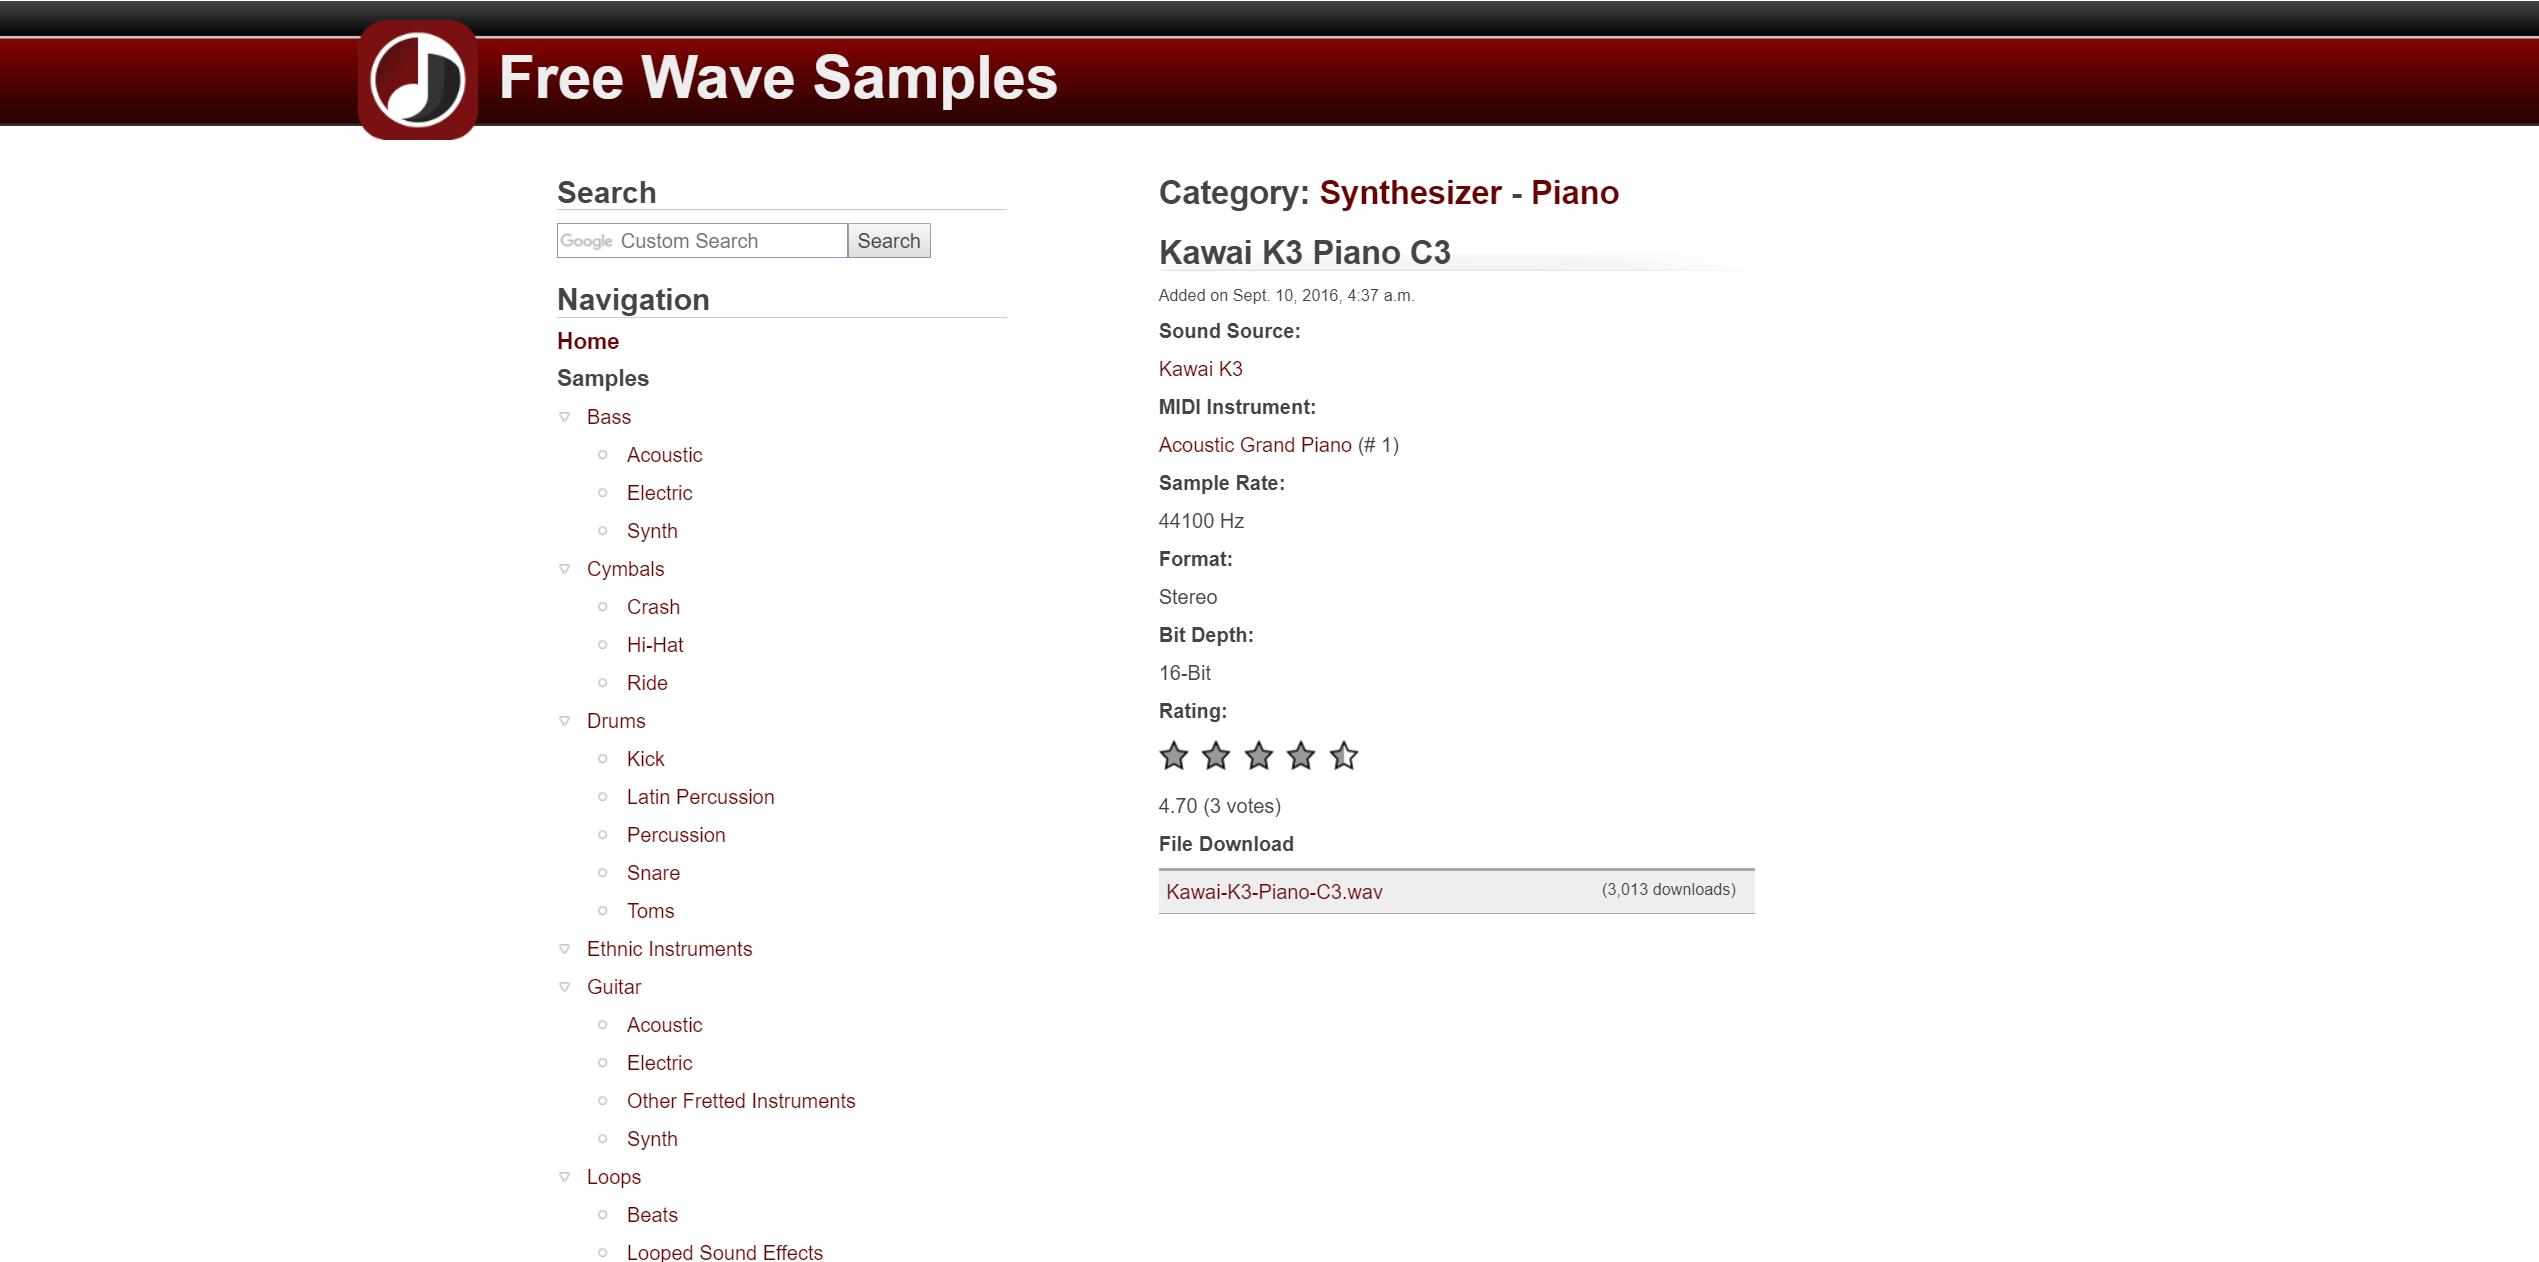 freewavesamples.com-02